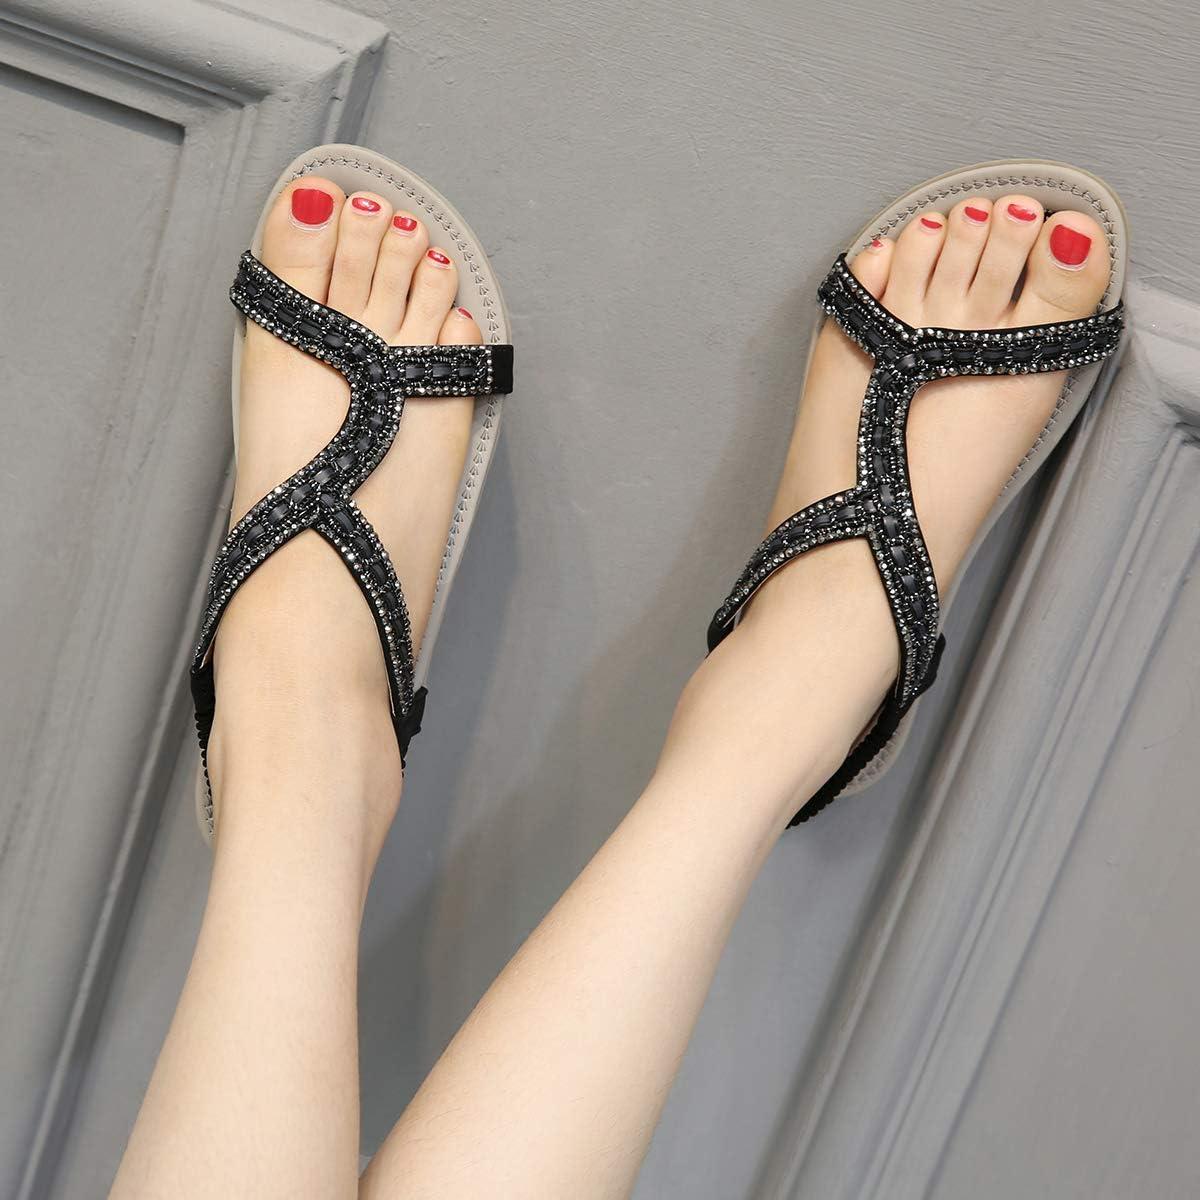 KSHUN Womens Summer Casual Bohemian Flat Sandals Rhinestone Beach Flat Sandal Shoes Black,US 5.5